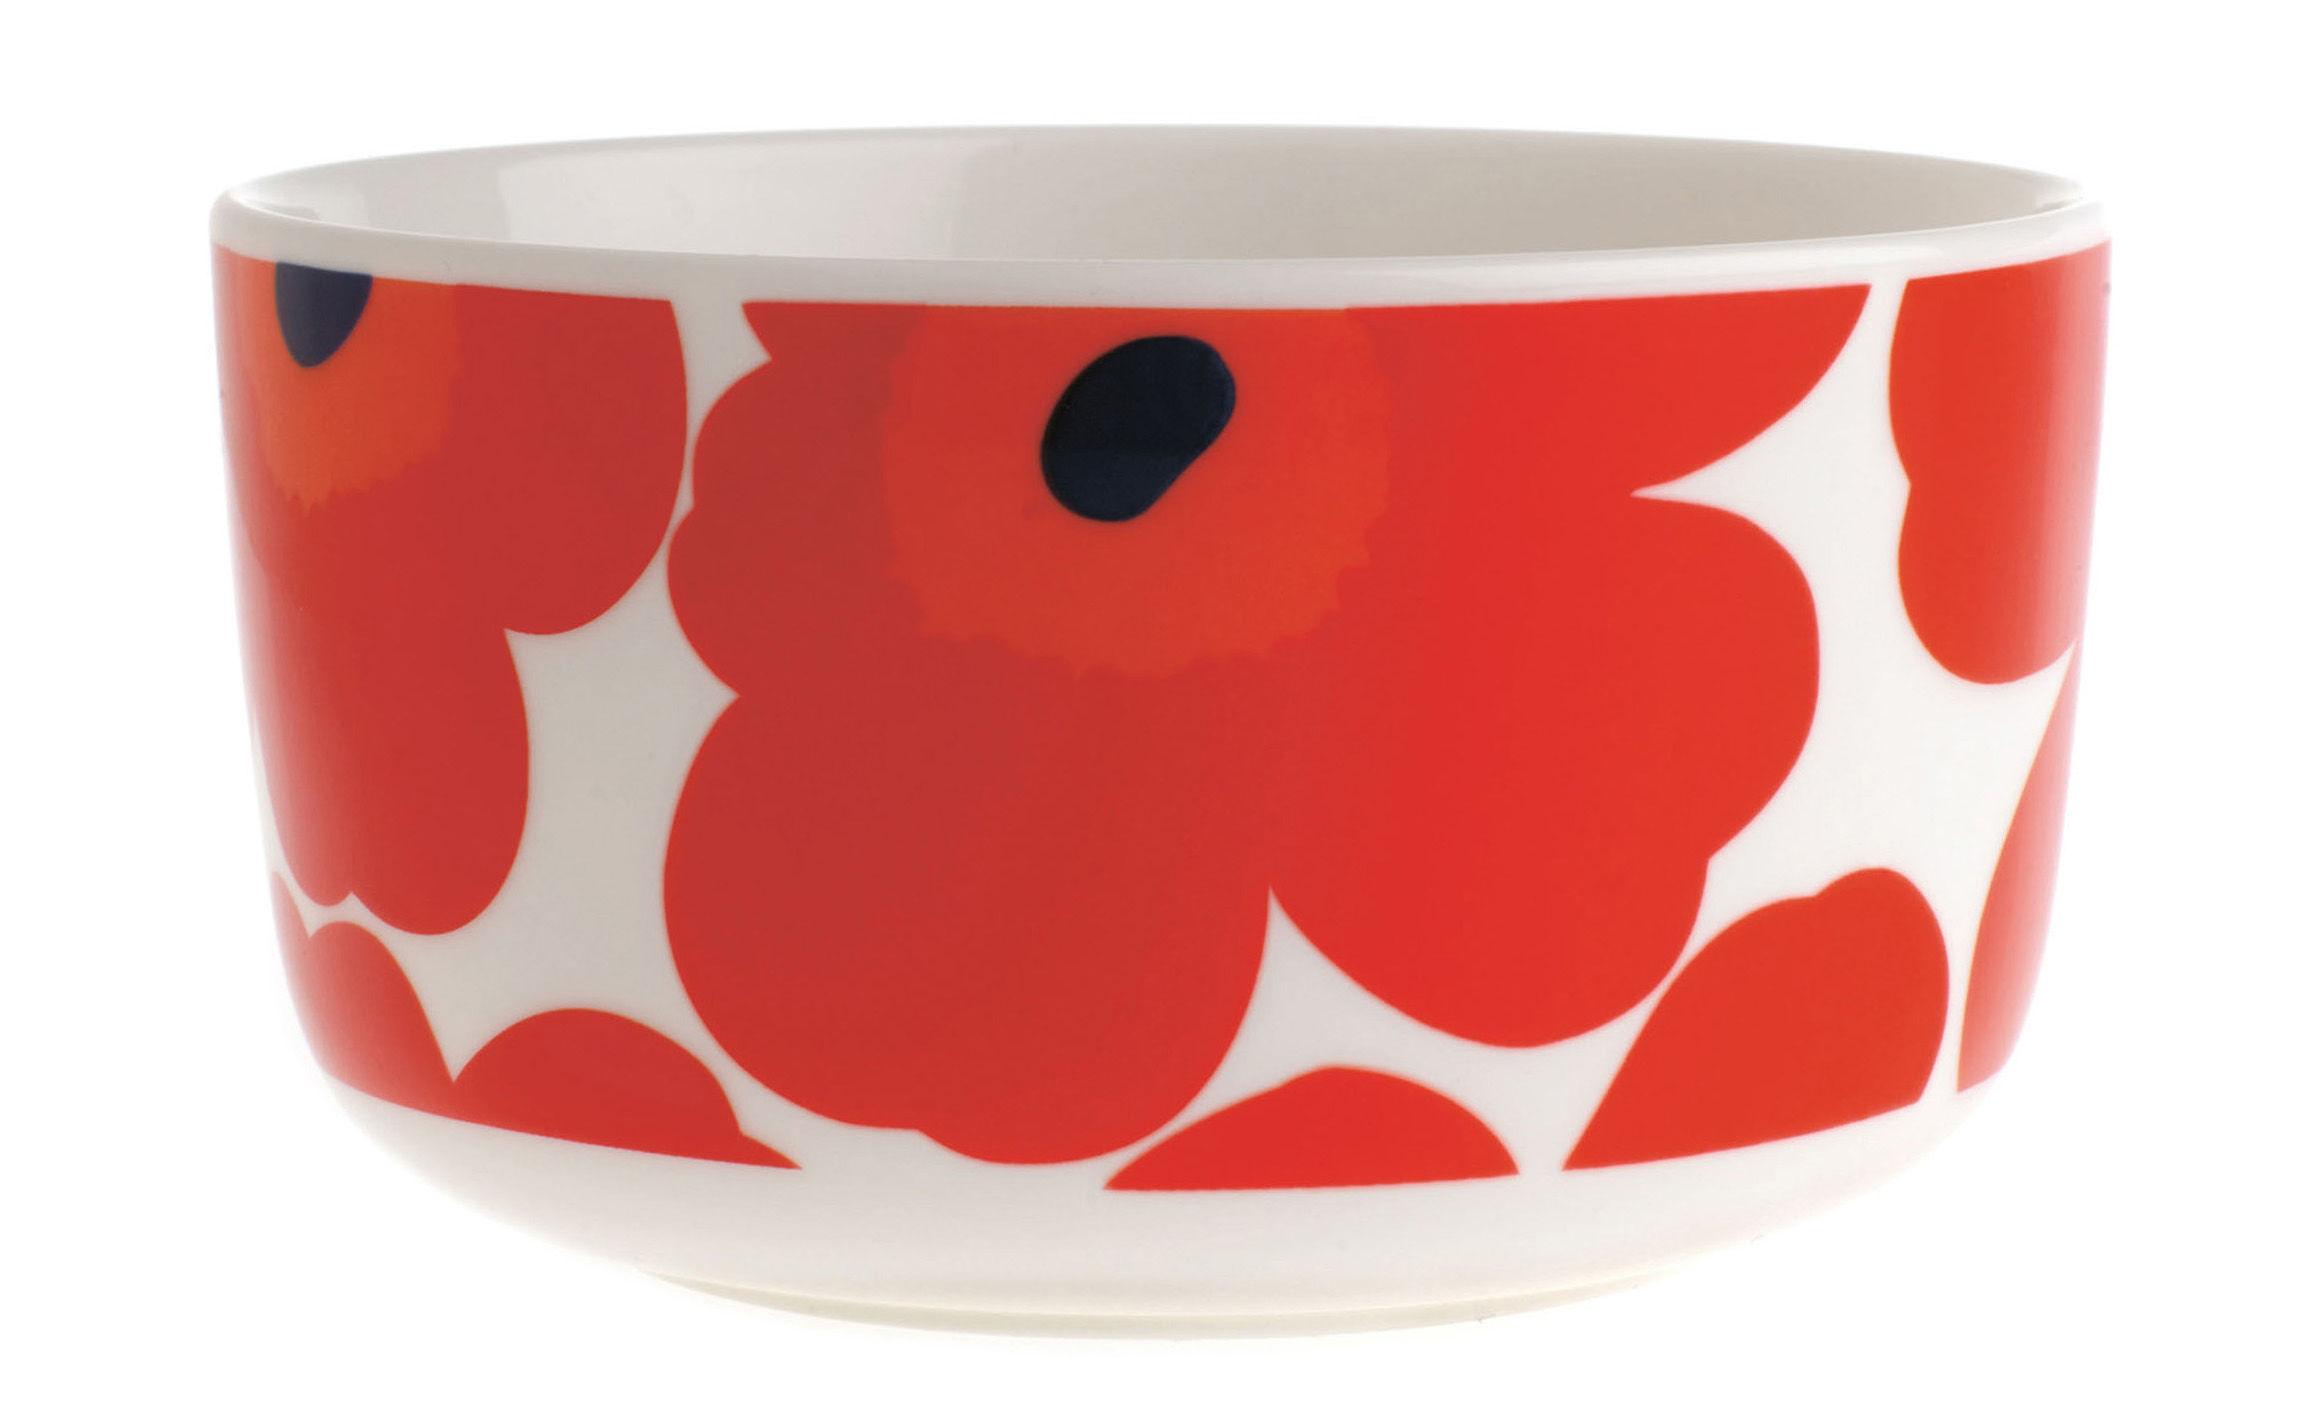 Tableware - Bowls - Unikko Bowl - Ø 12,5 cm by Marimekko - Ø 12,5 cm - Unikko - White & red - Enamelled china